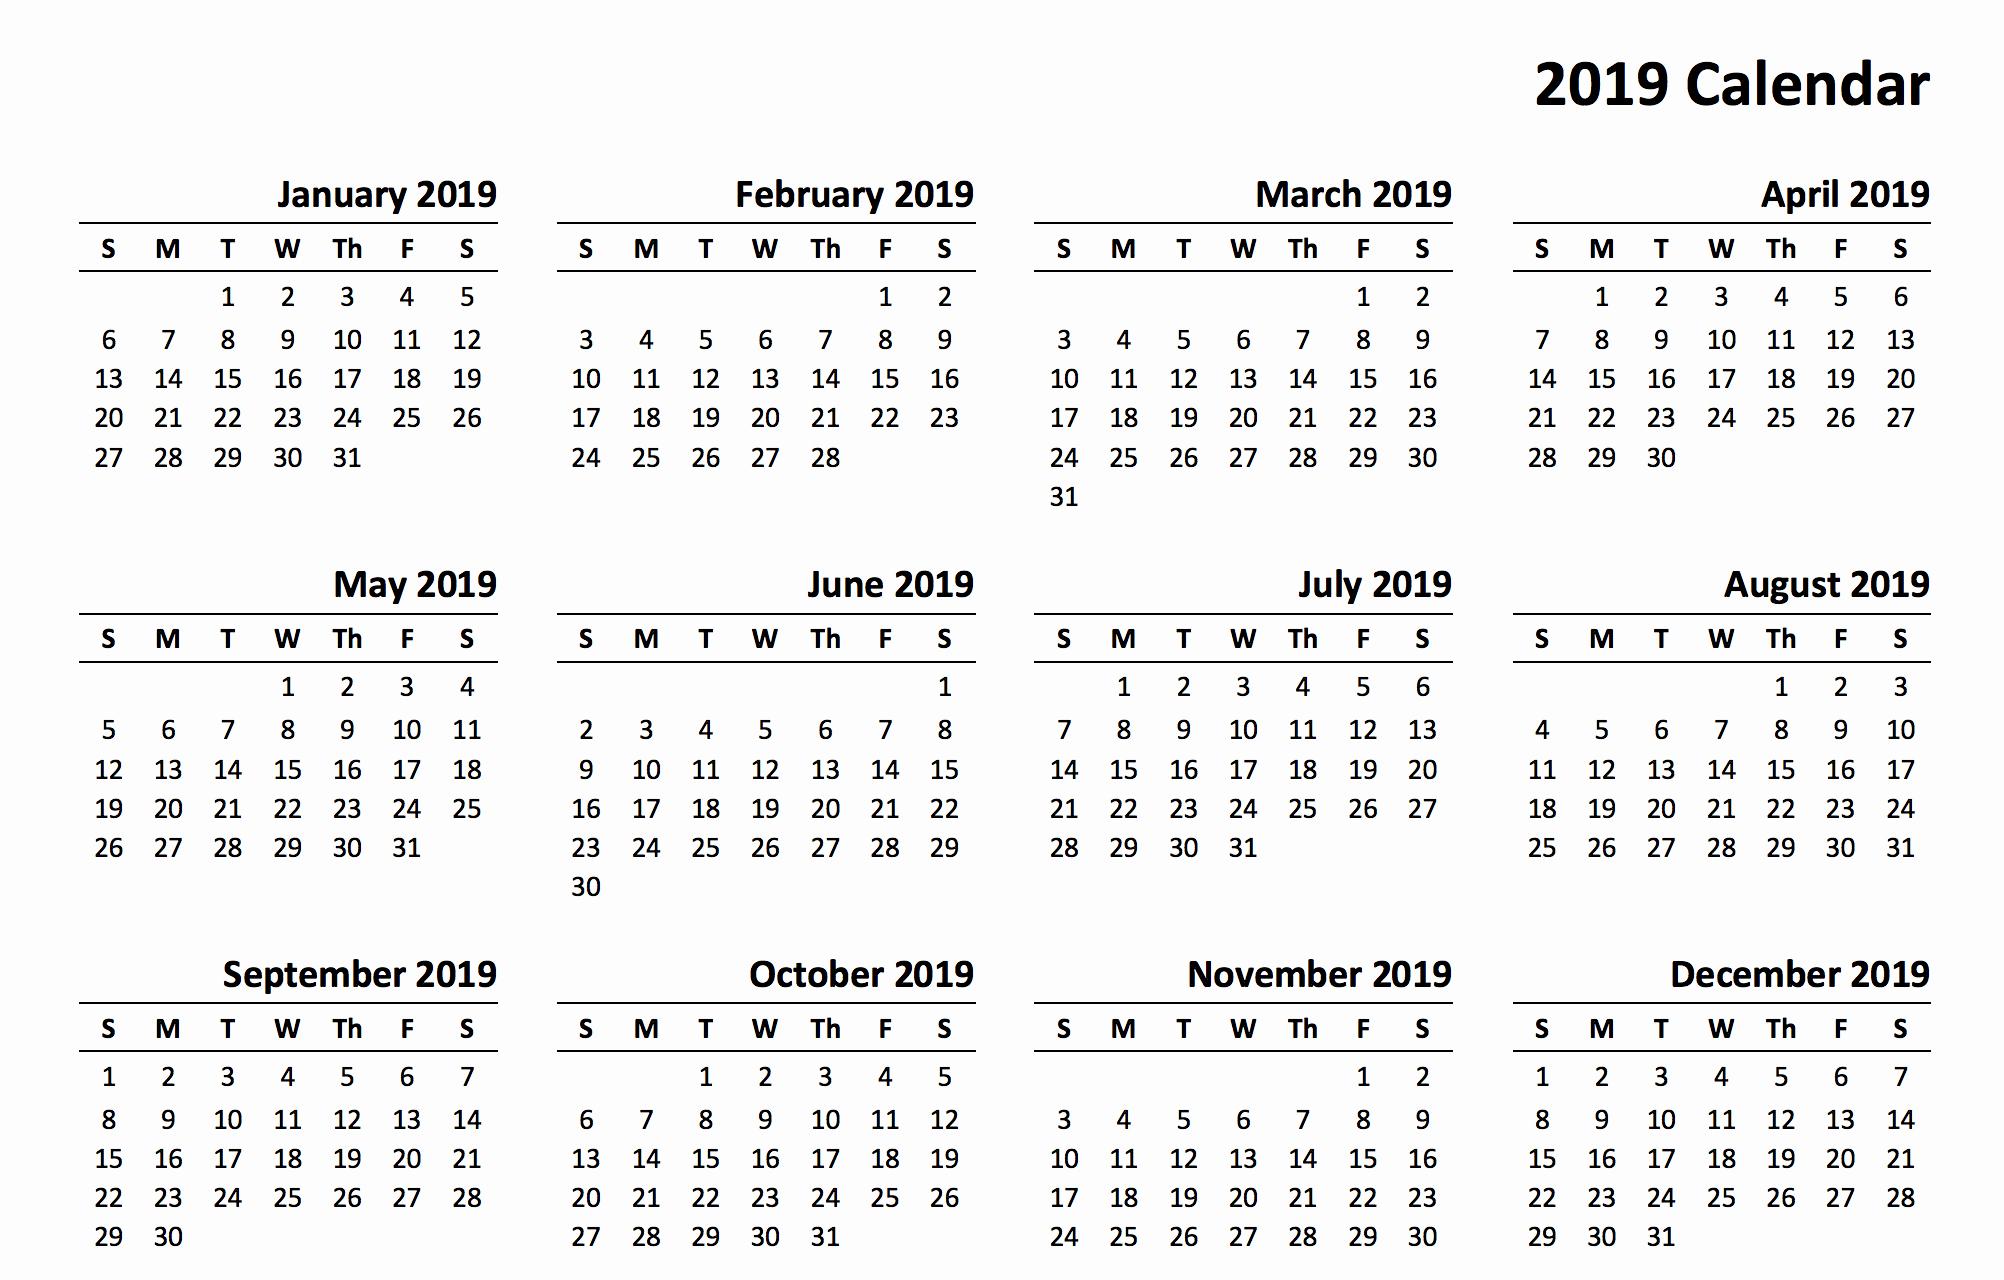 12 Month Calendar Template Inspirational 12 Month Calendar 2019 Printable